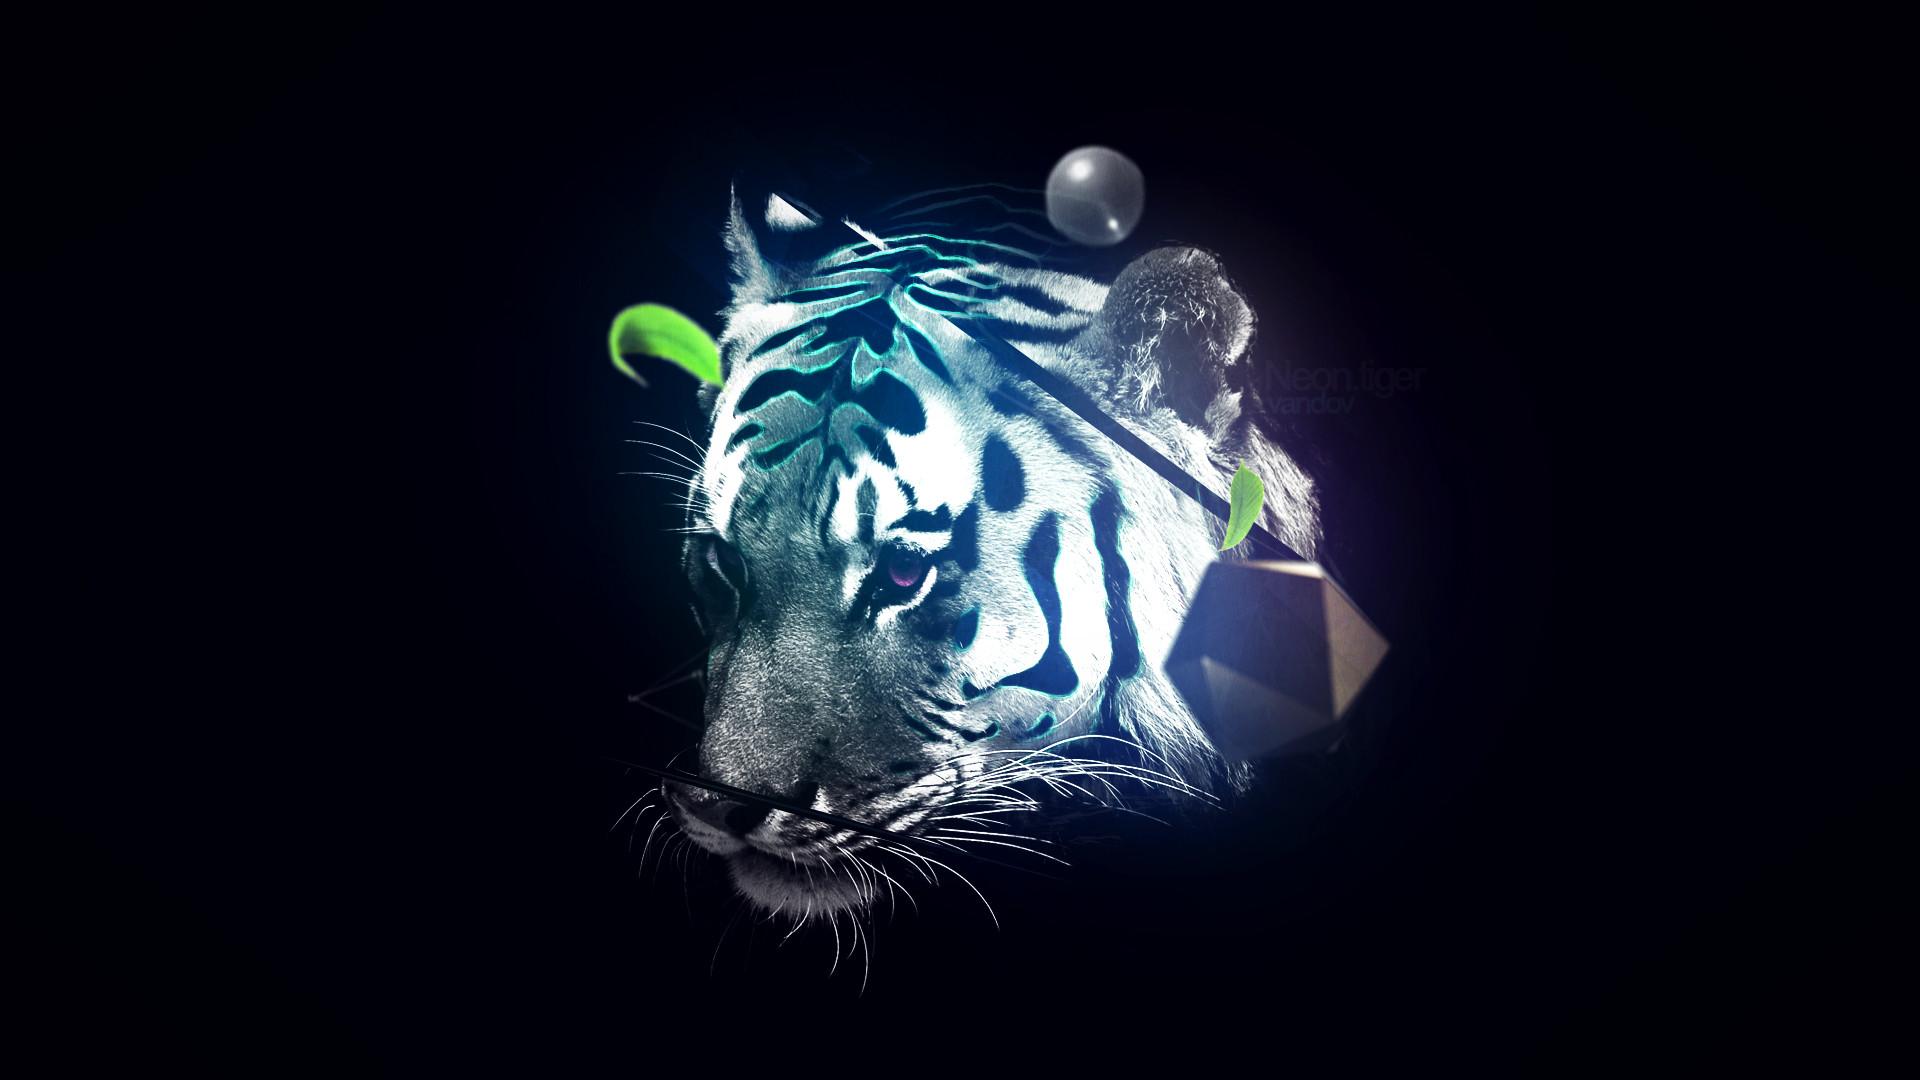 Neon Tiger by DateArts1 Neon Tiger by DateArts1